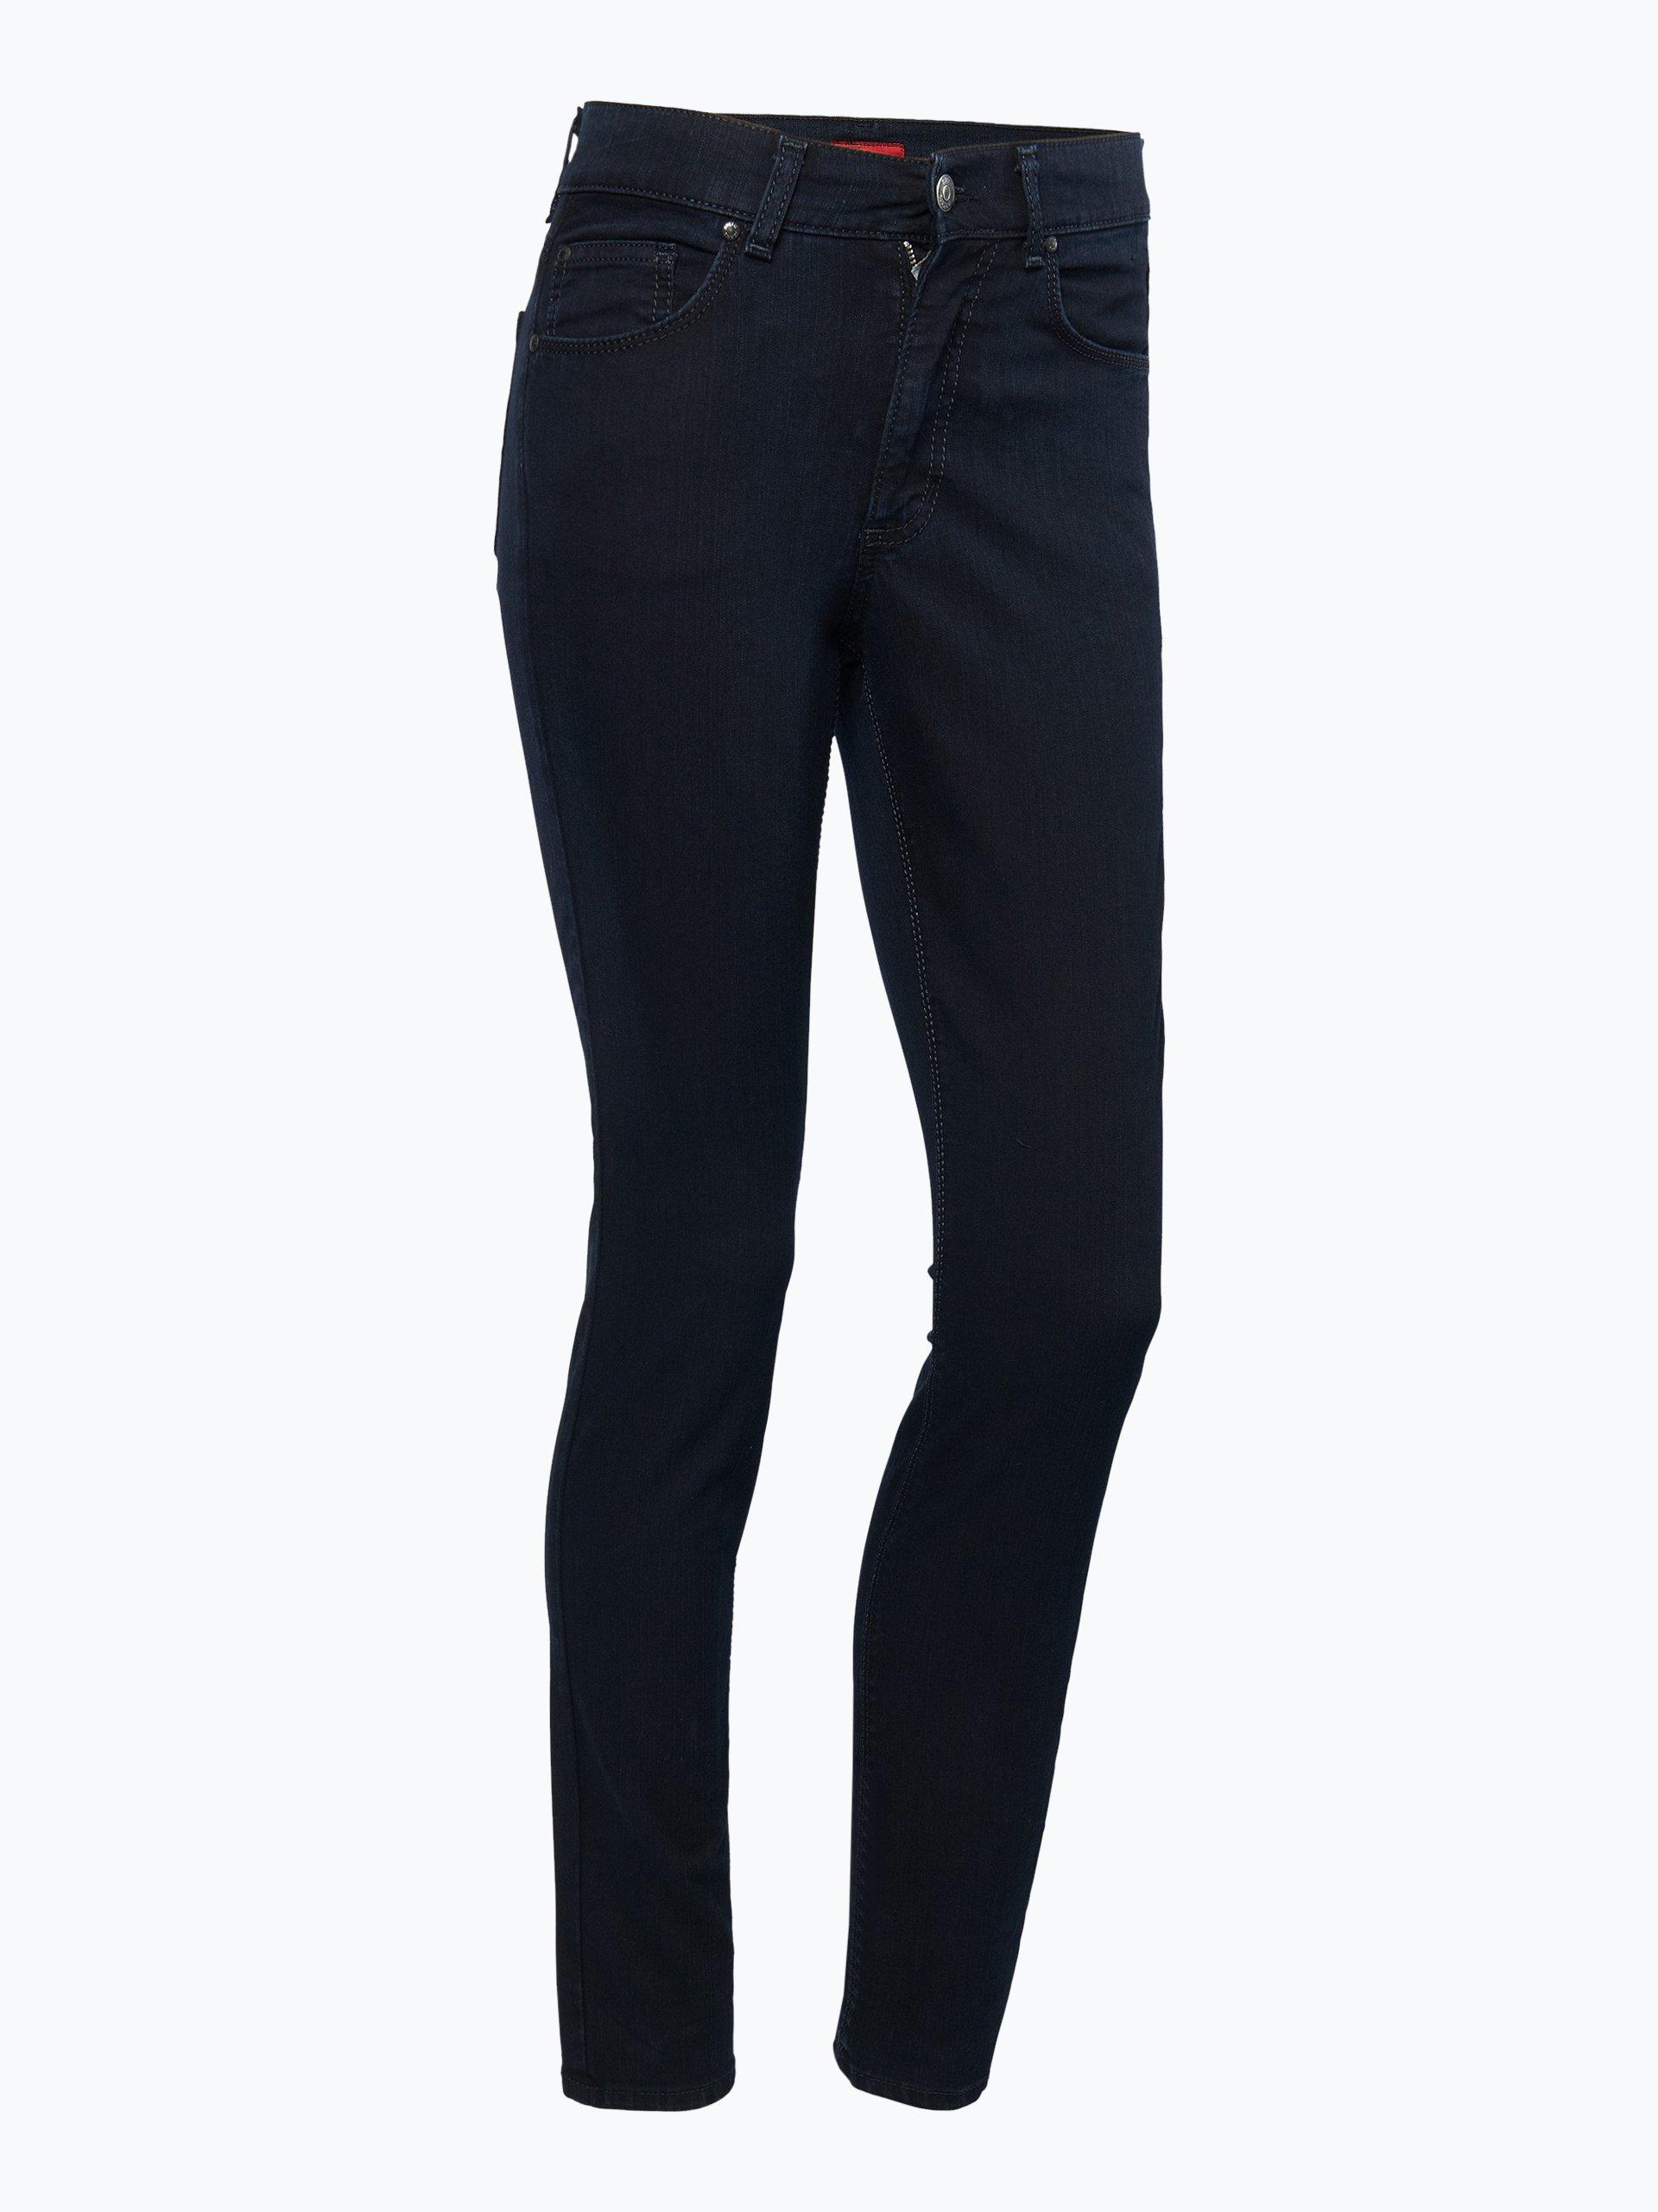 angels damen jeans skinny dark stone uni online kaufen. Black Bedroom Furniture Sets. Home Design Ideas